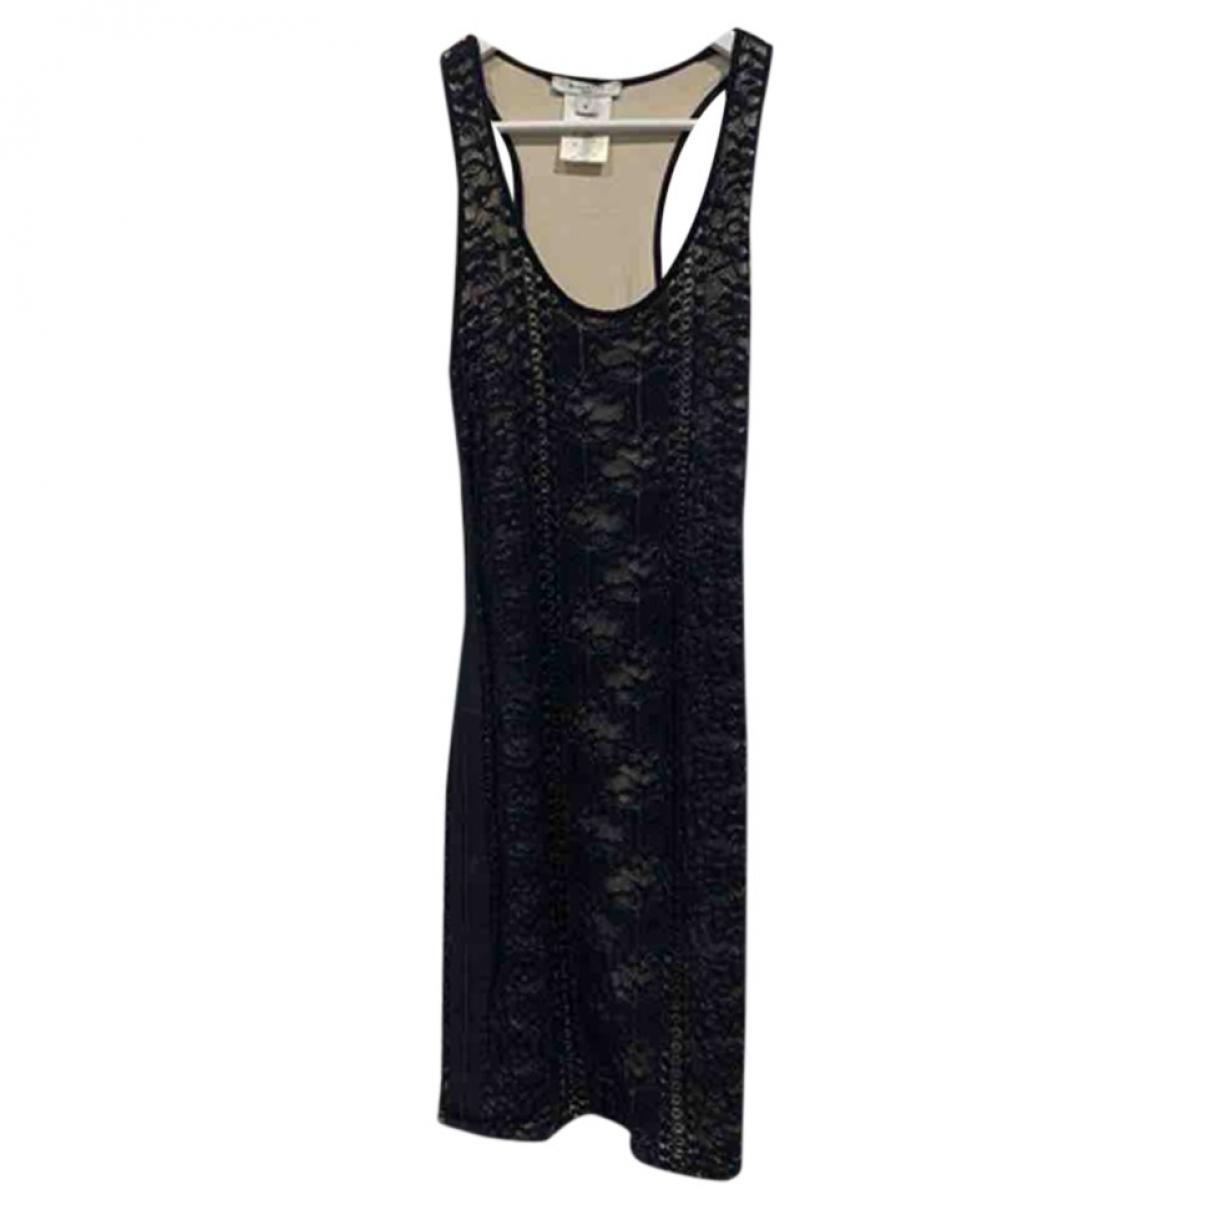 Givenchy \N Kleid in  Schwarz Synthetik